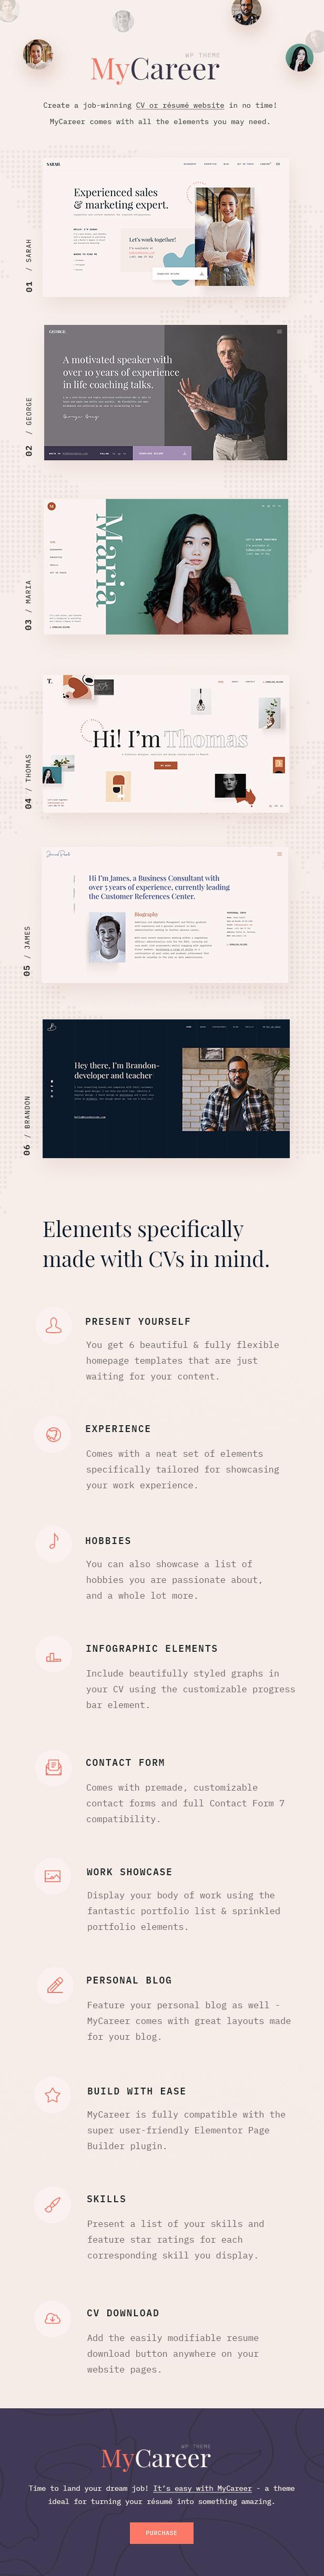 MyCareer - Resume WordPress Theme - 2